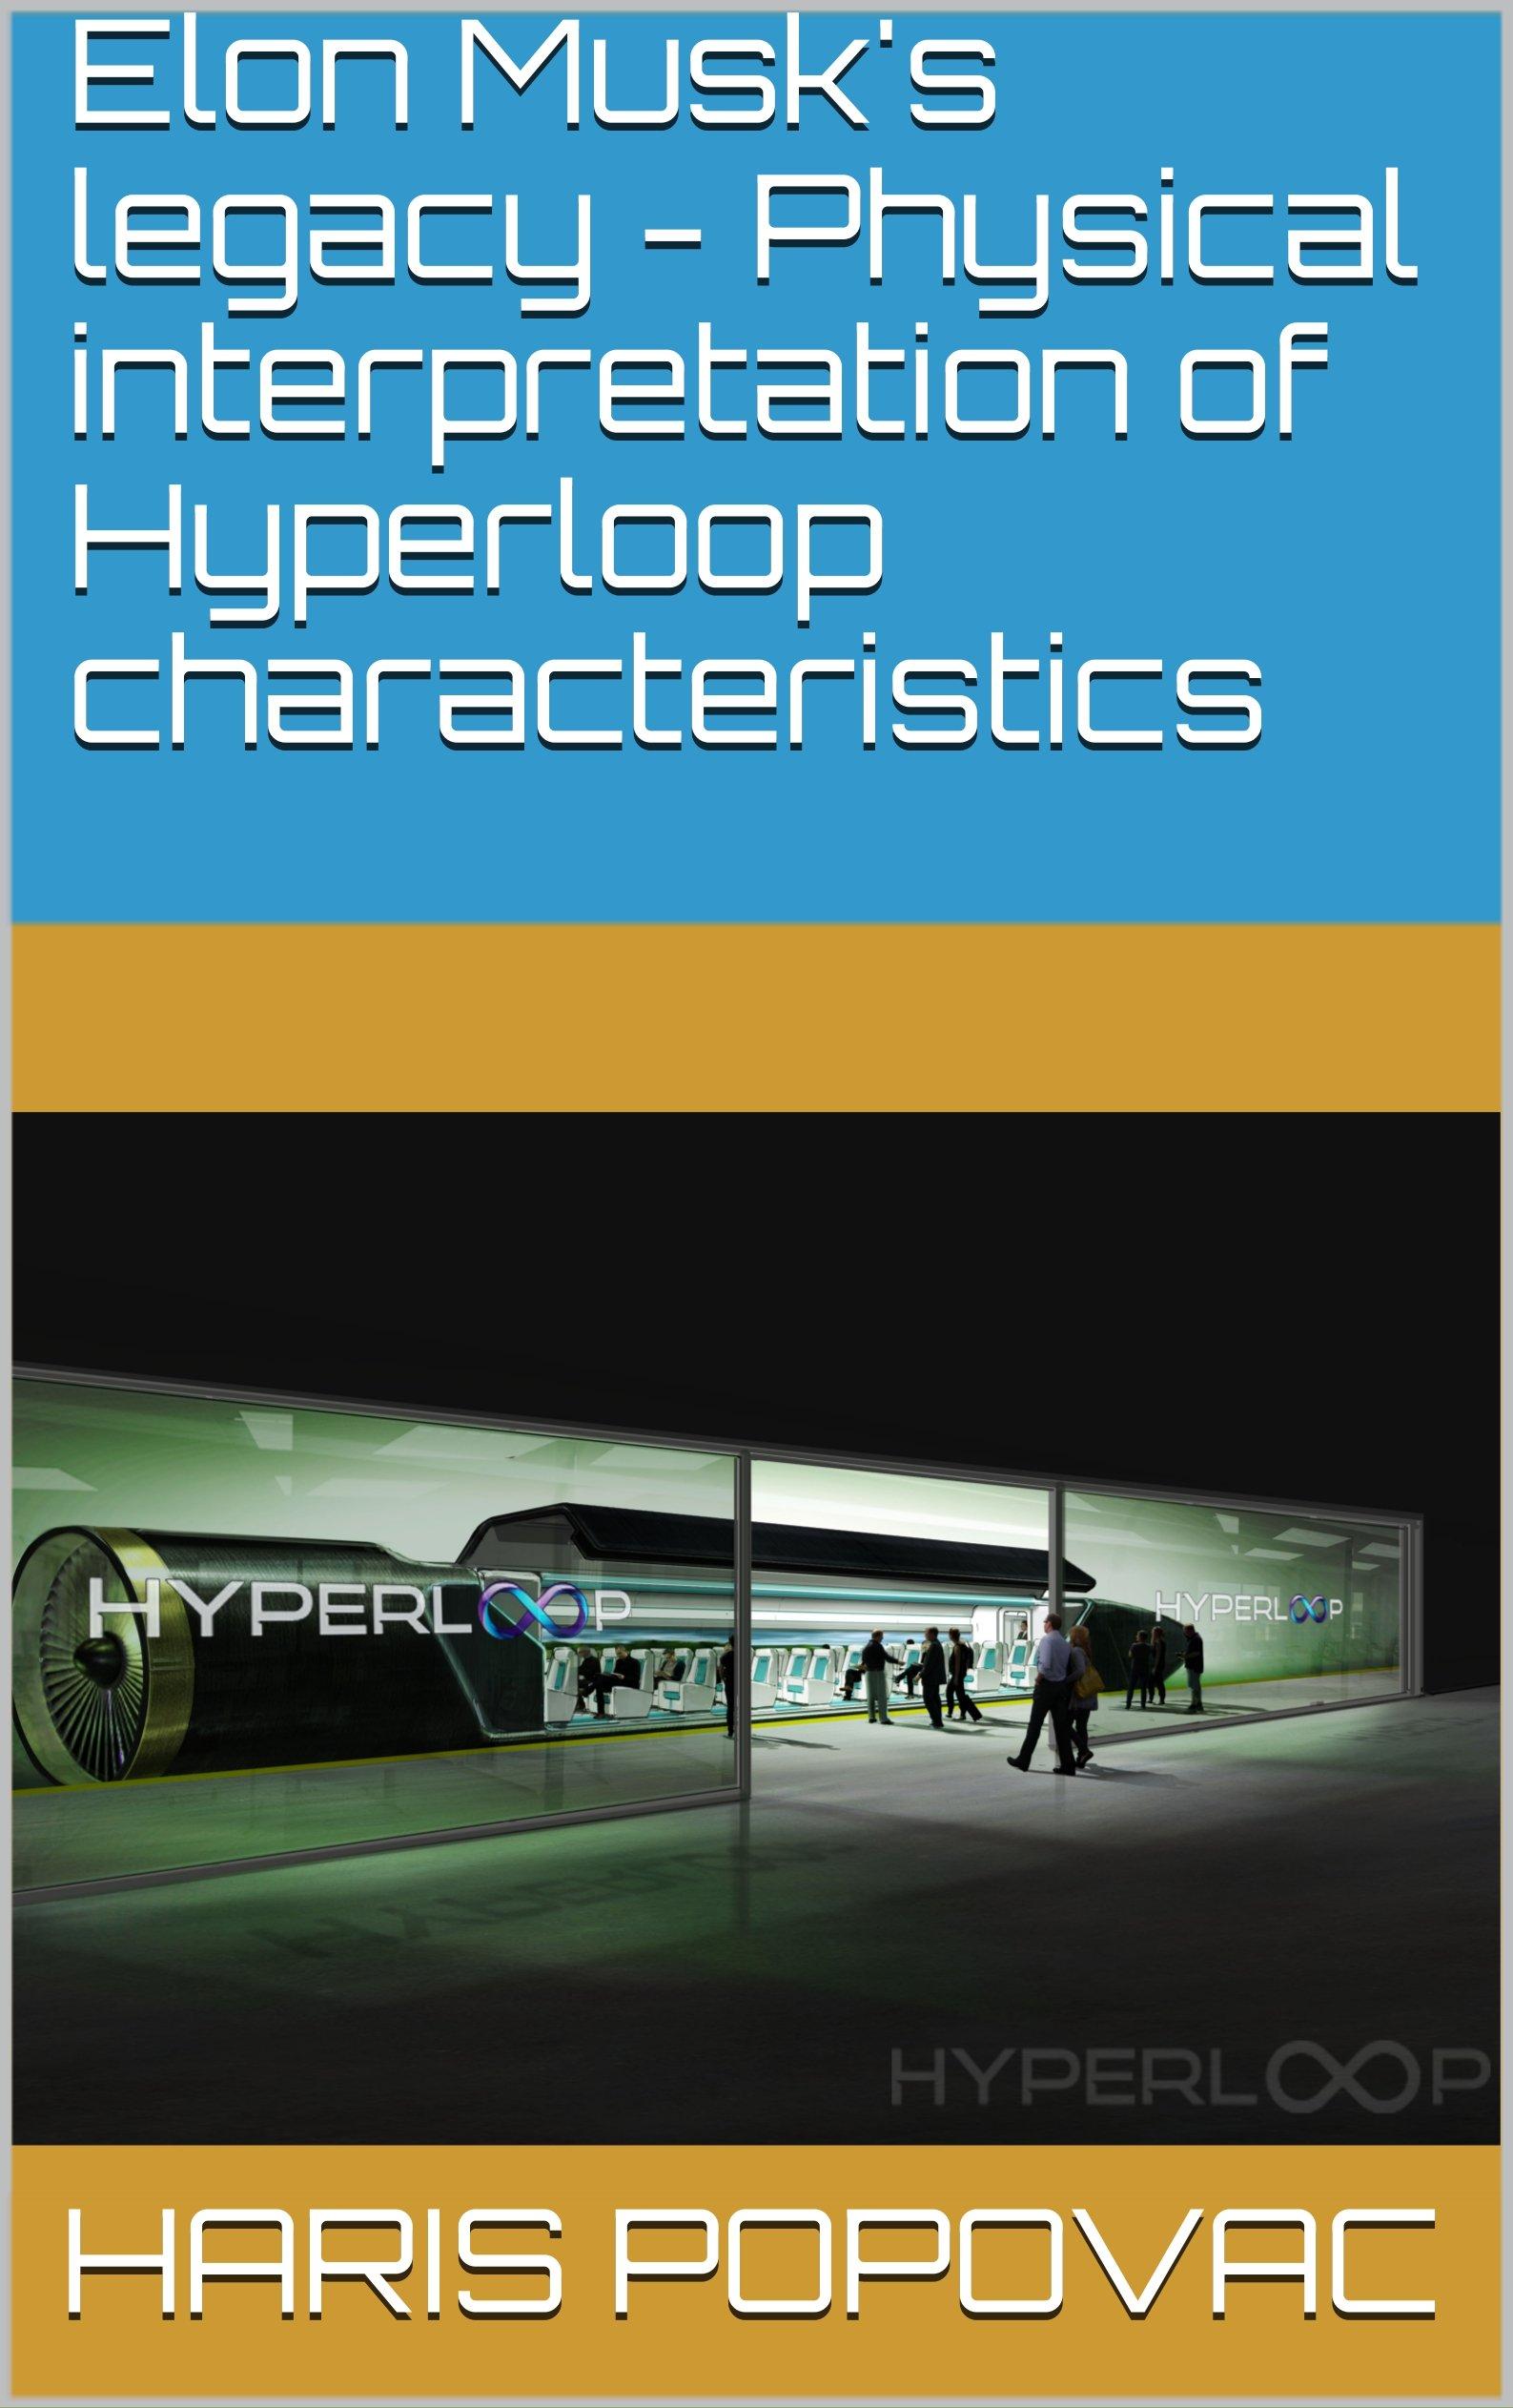 Elon Musk's legacy - Physical interpretation of Hyperloop characteristics